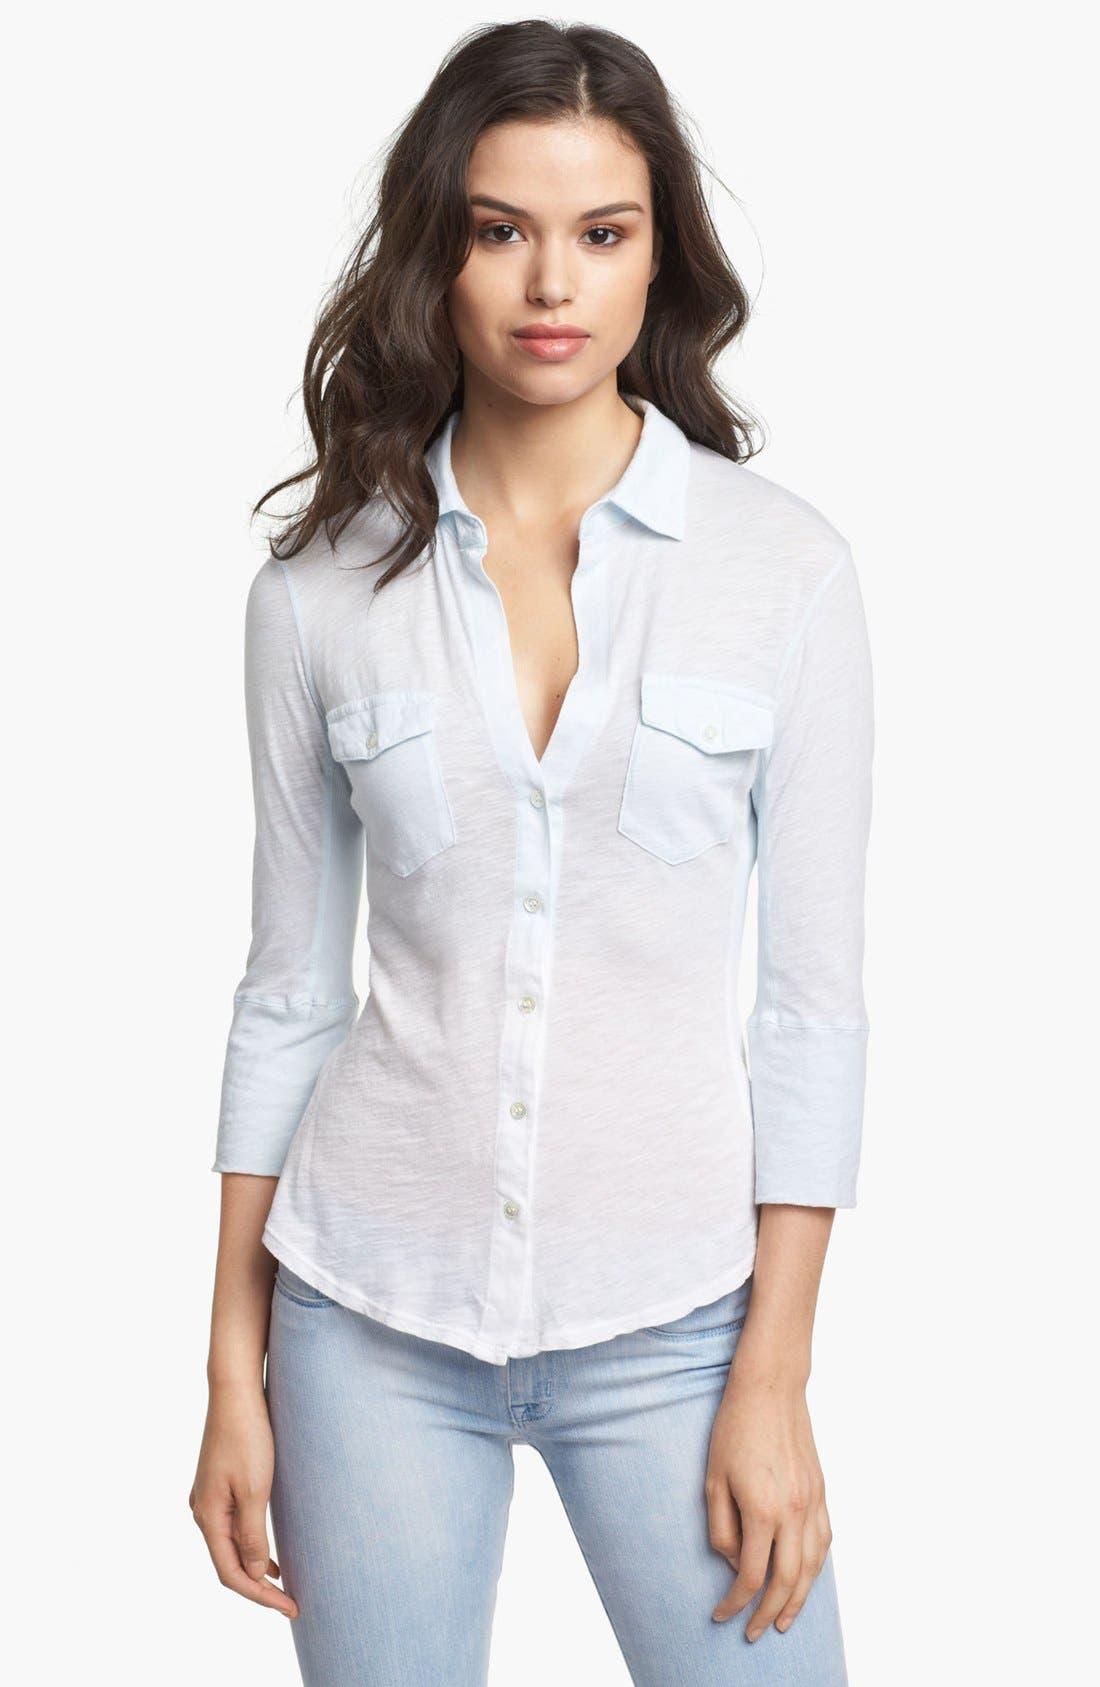 Alternate Image 1 Selected - James Perse Pocket Shirt